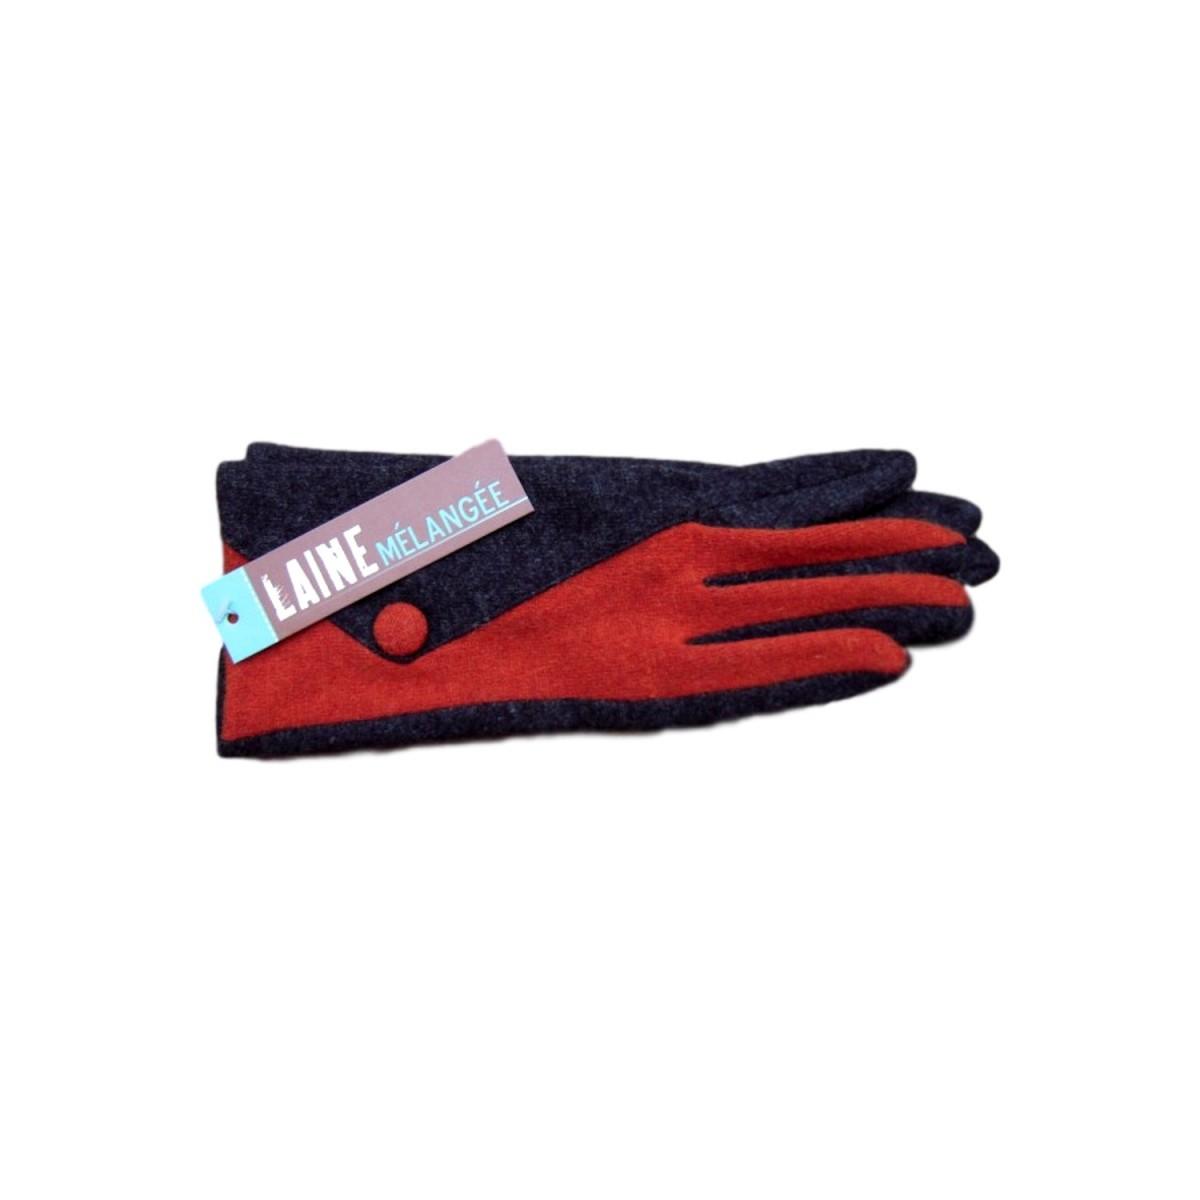 https://www.boutique-augustin.com/1372-thickbox/gants-femme-bicolores-laine-melangee-.jpg